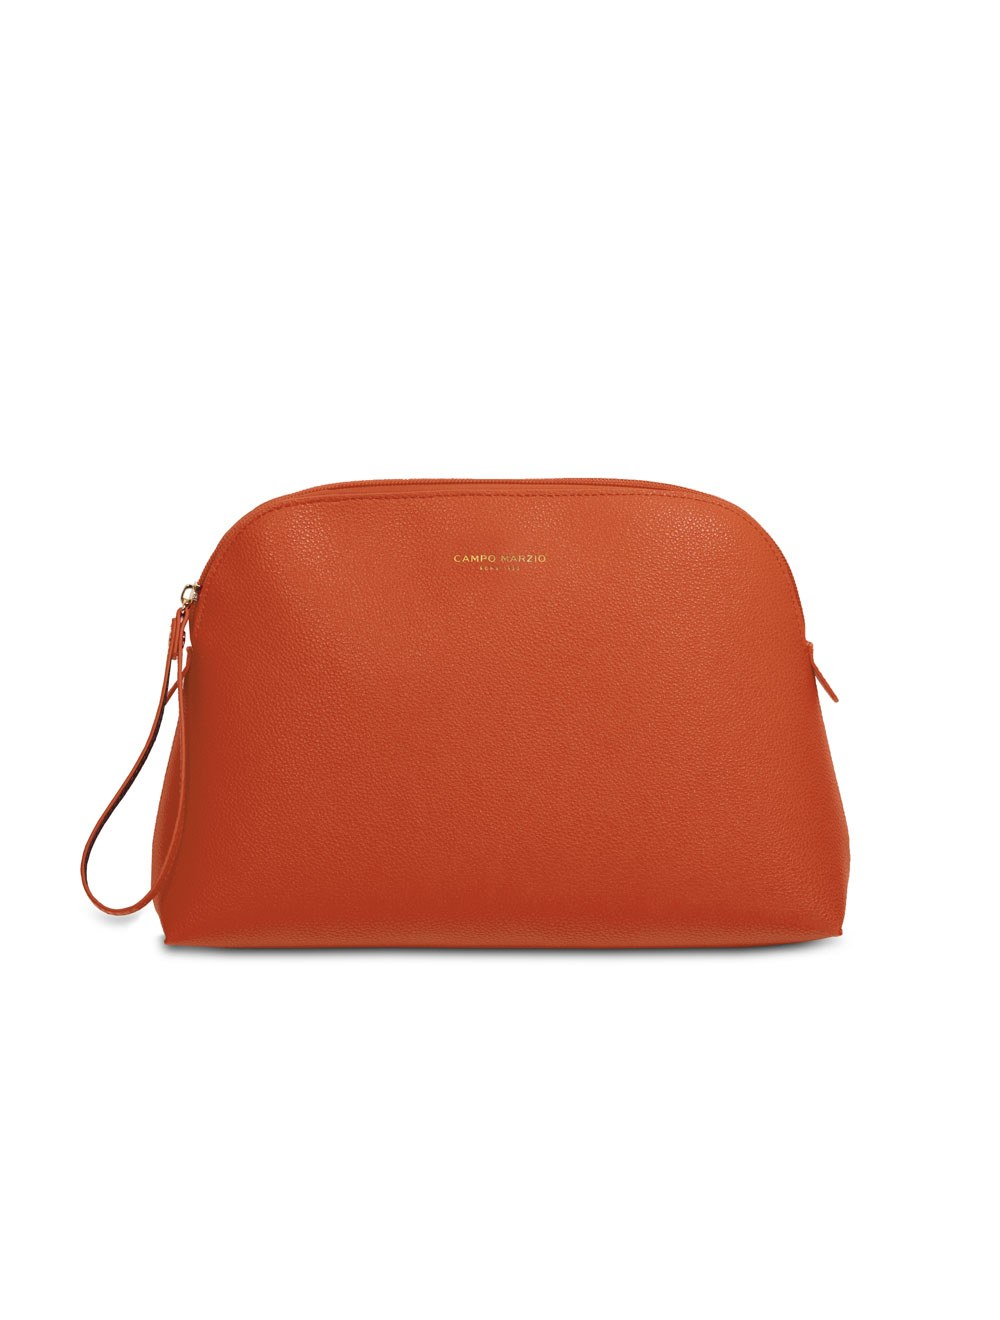 Bag with wristlet - Apricot